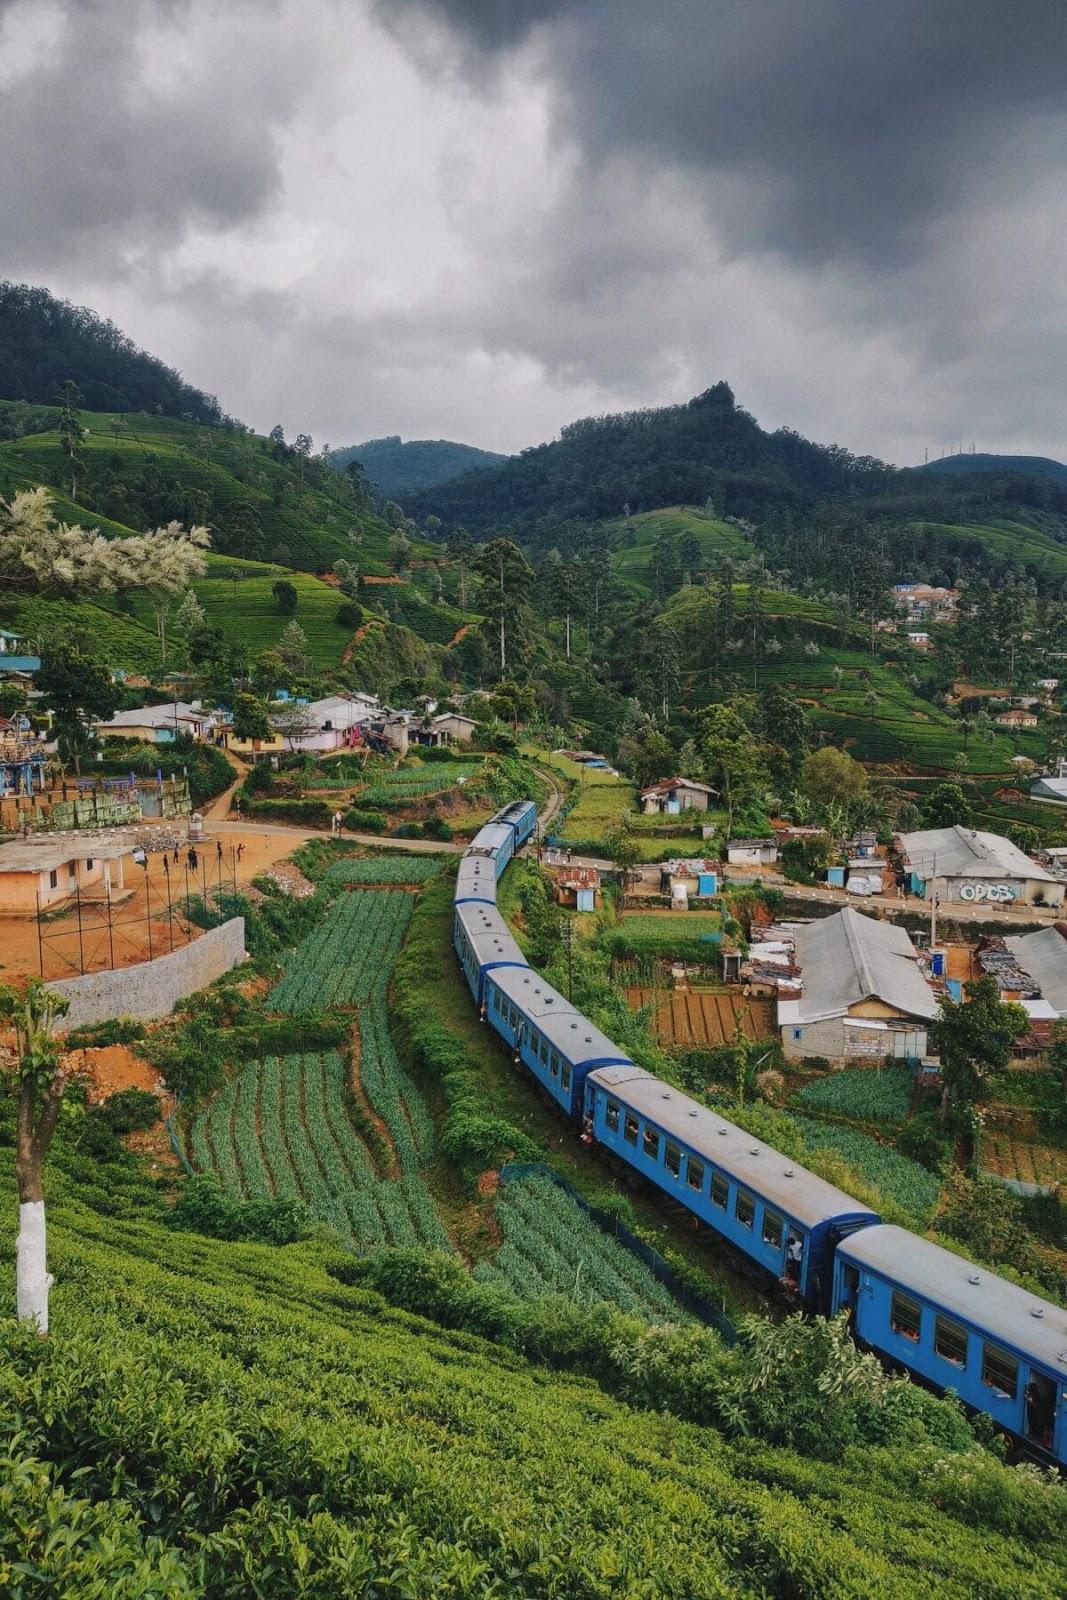 Sri Lanka train passing through village